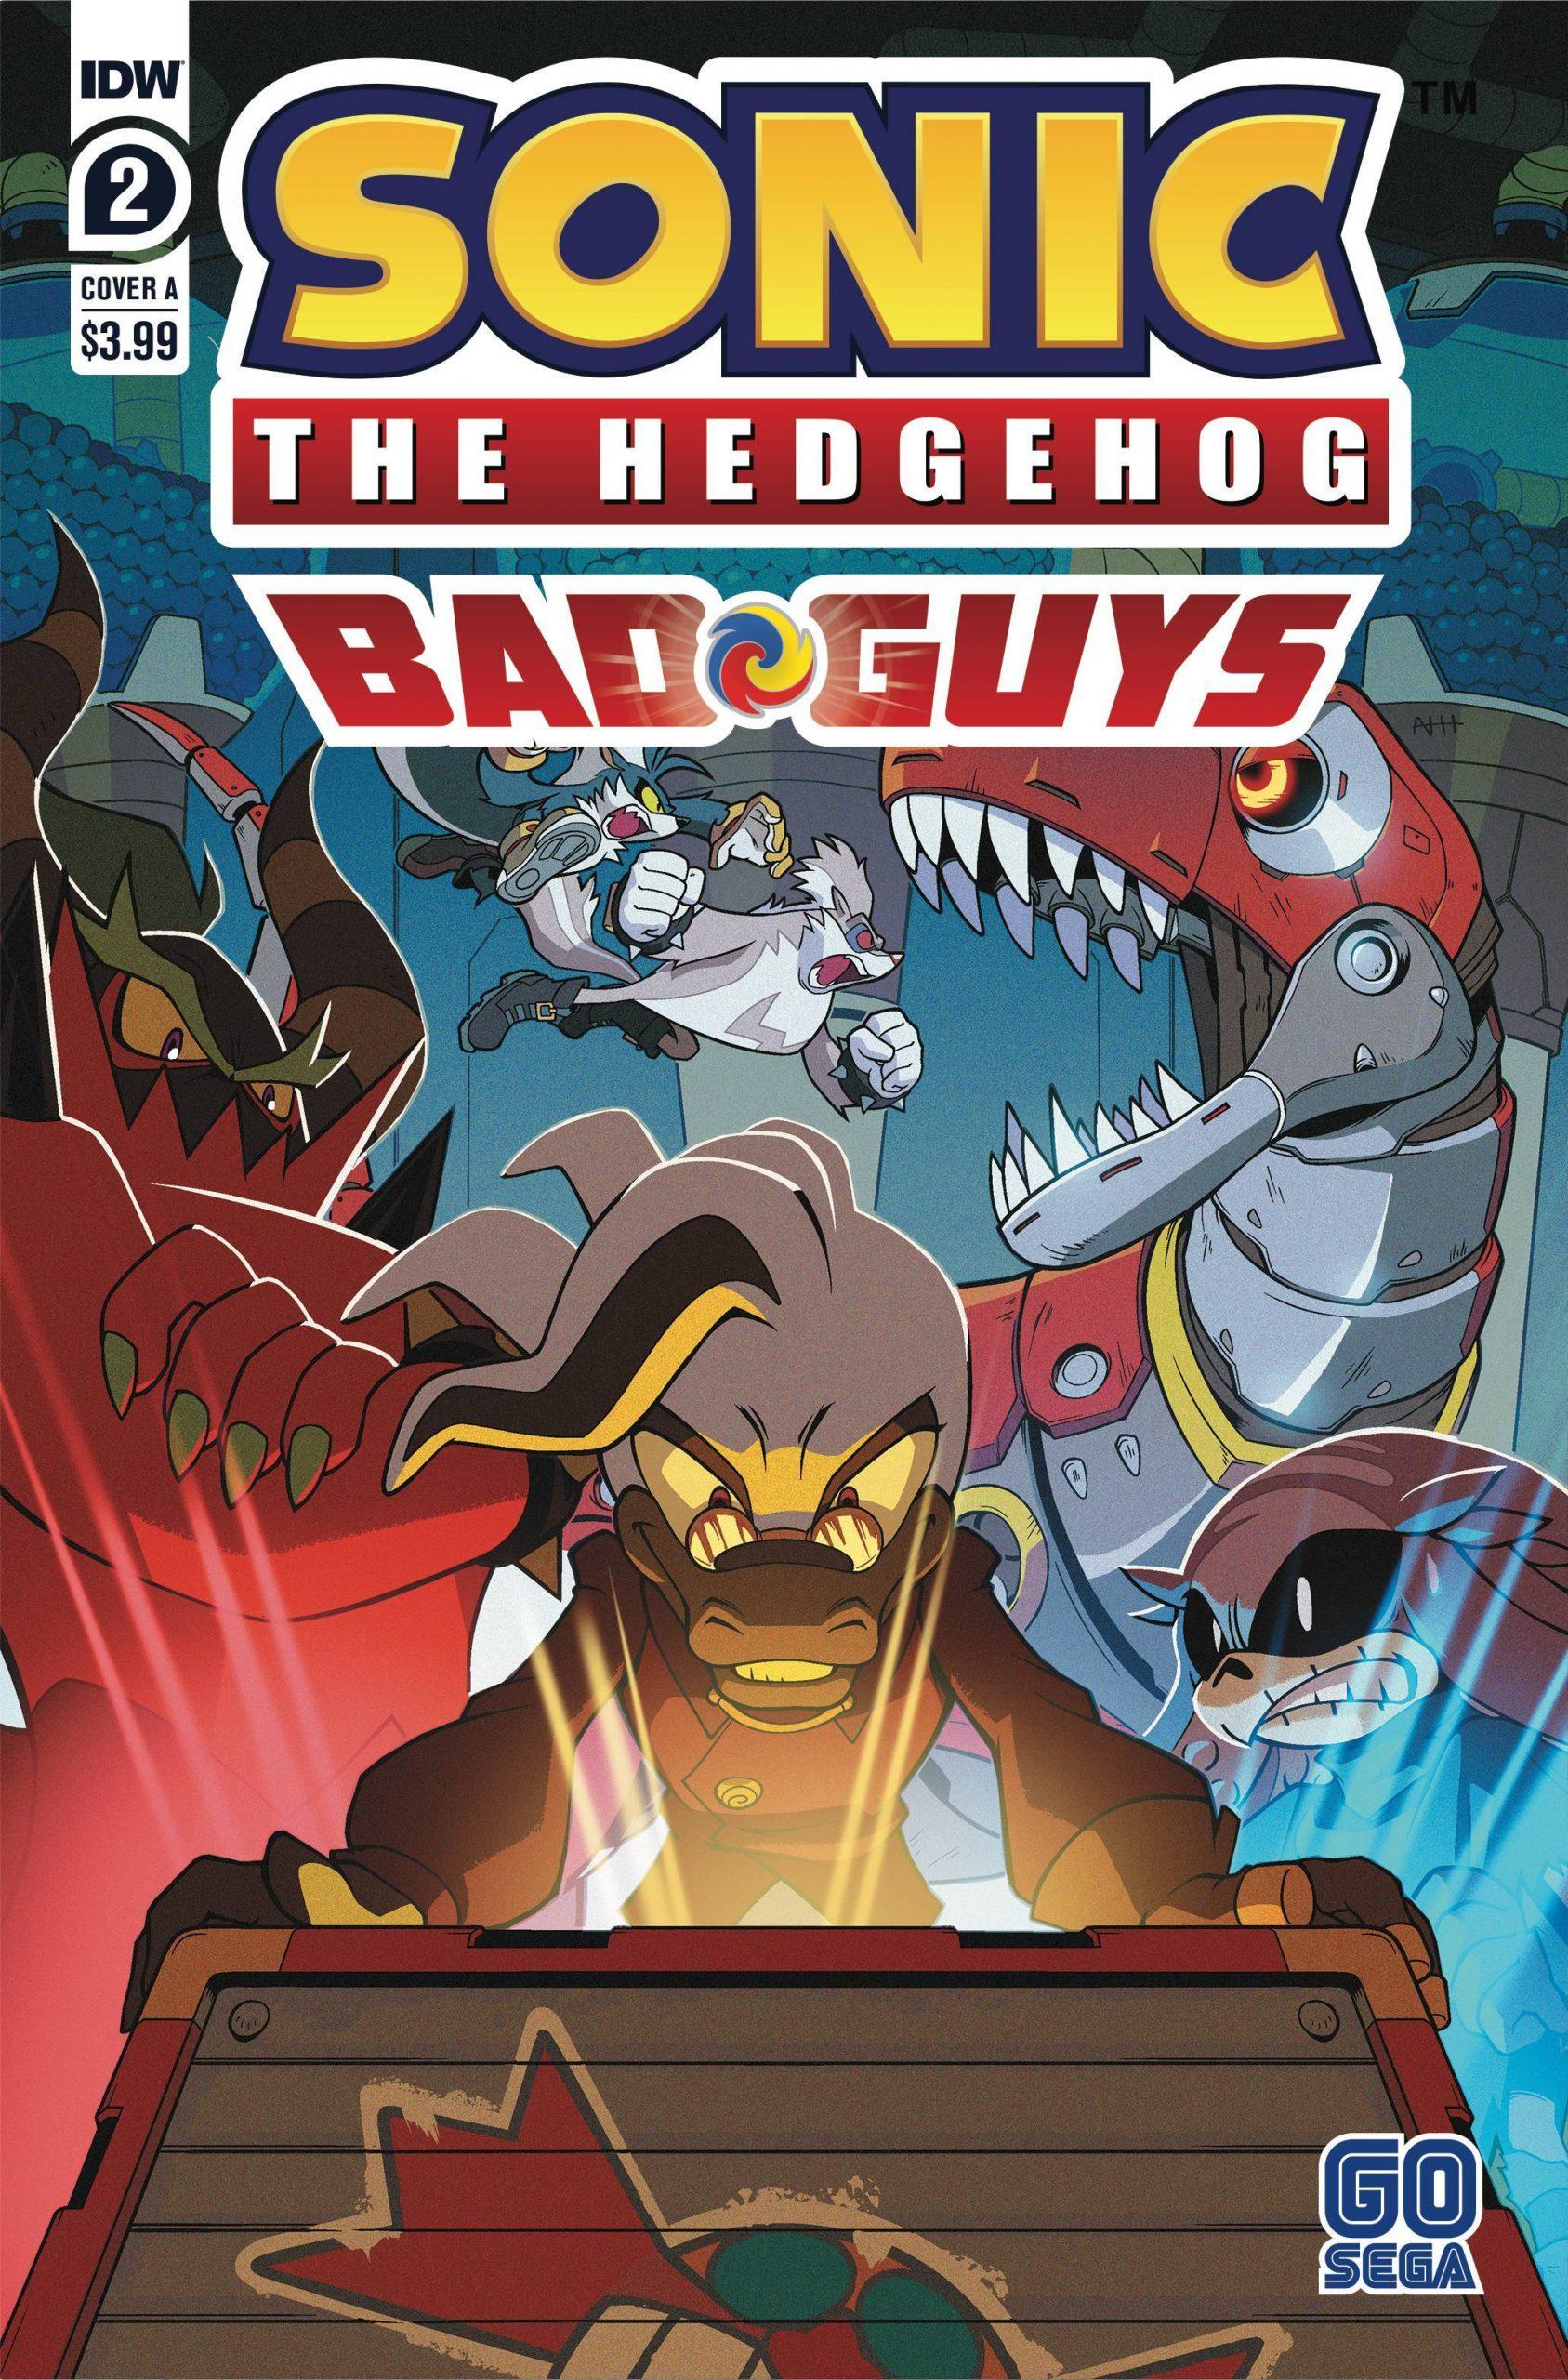 Sonic The Hedgehog: Bad Guys #2